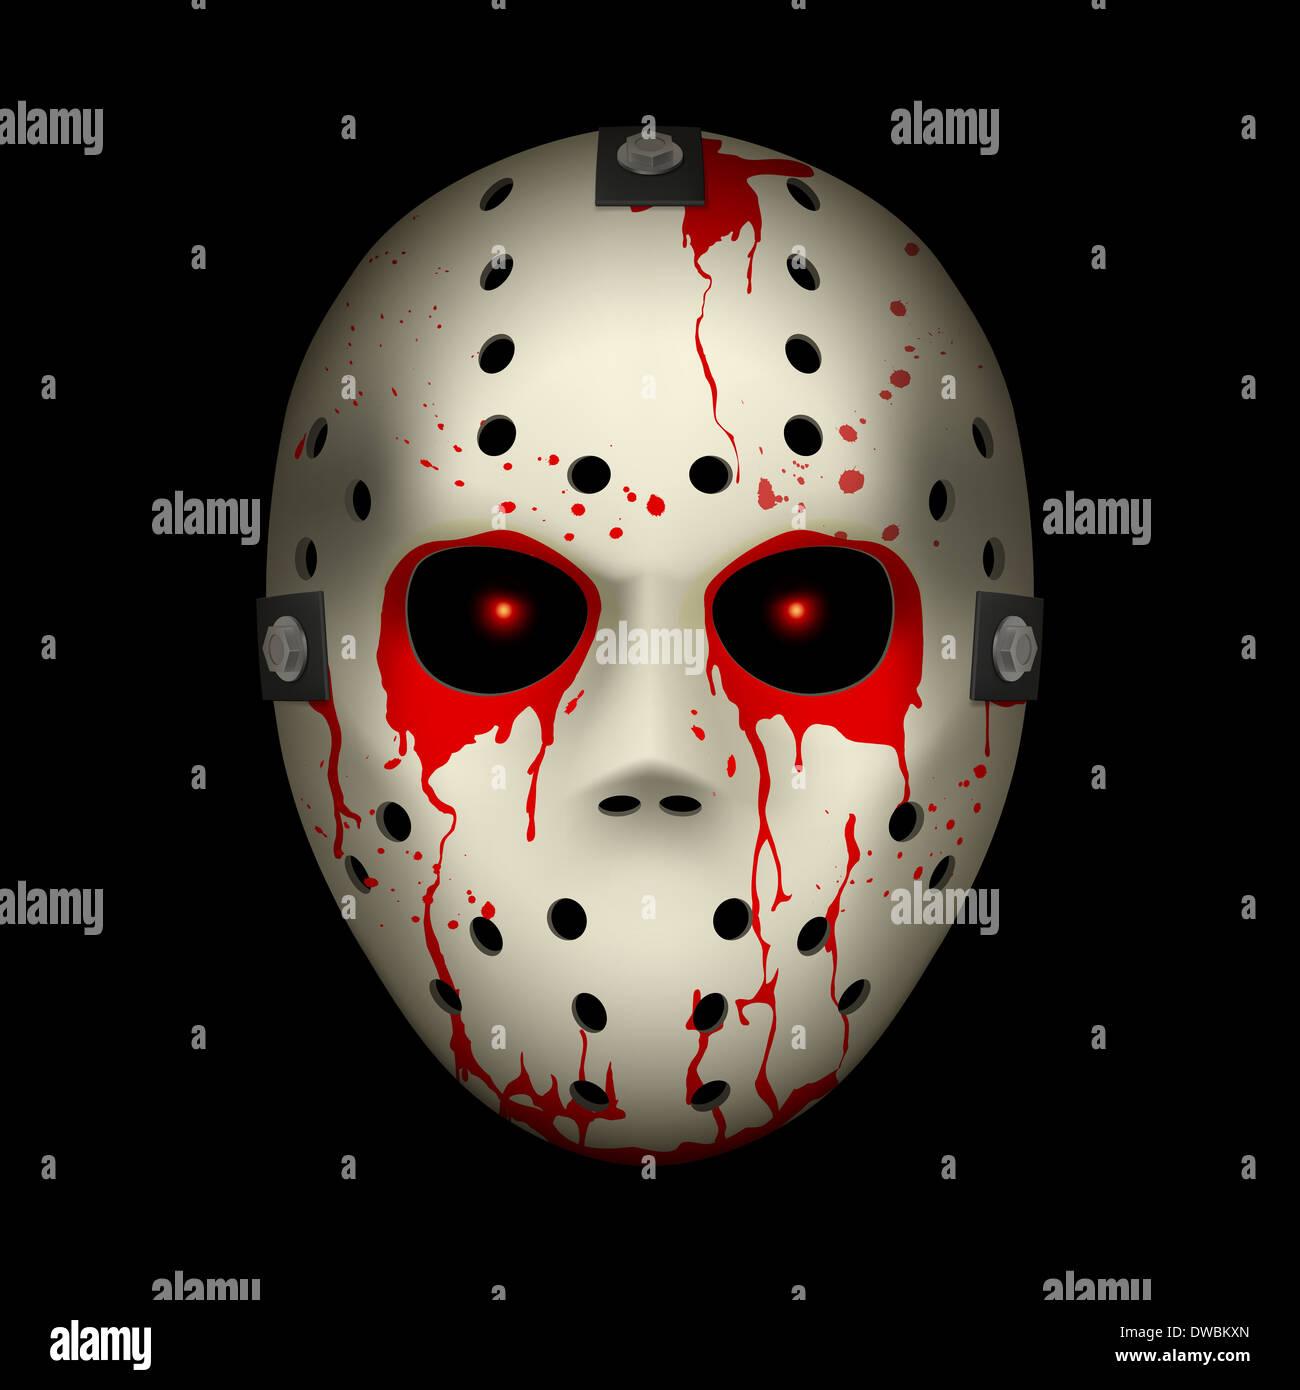 Bloody Hockey Mask. Illustration on black background for design - Stock Image